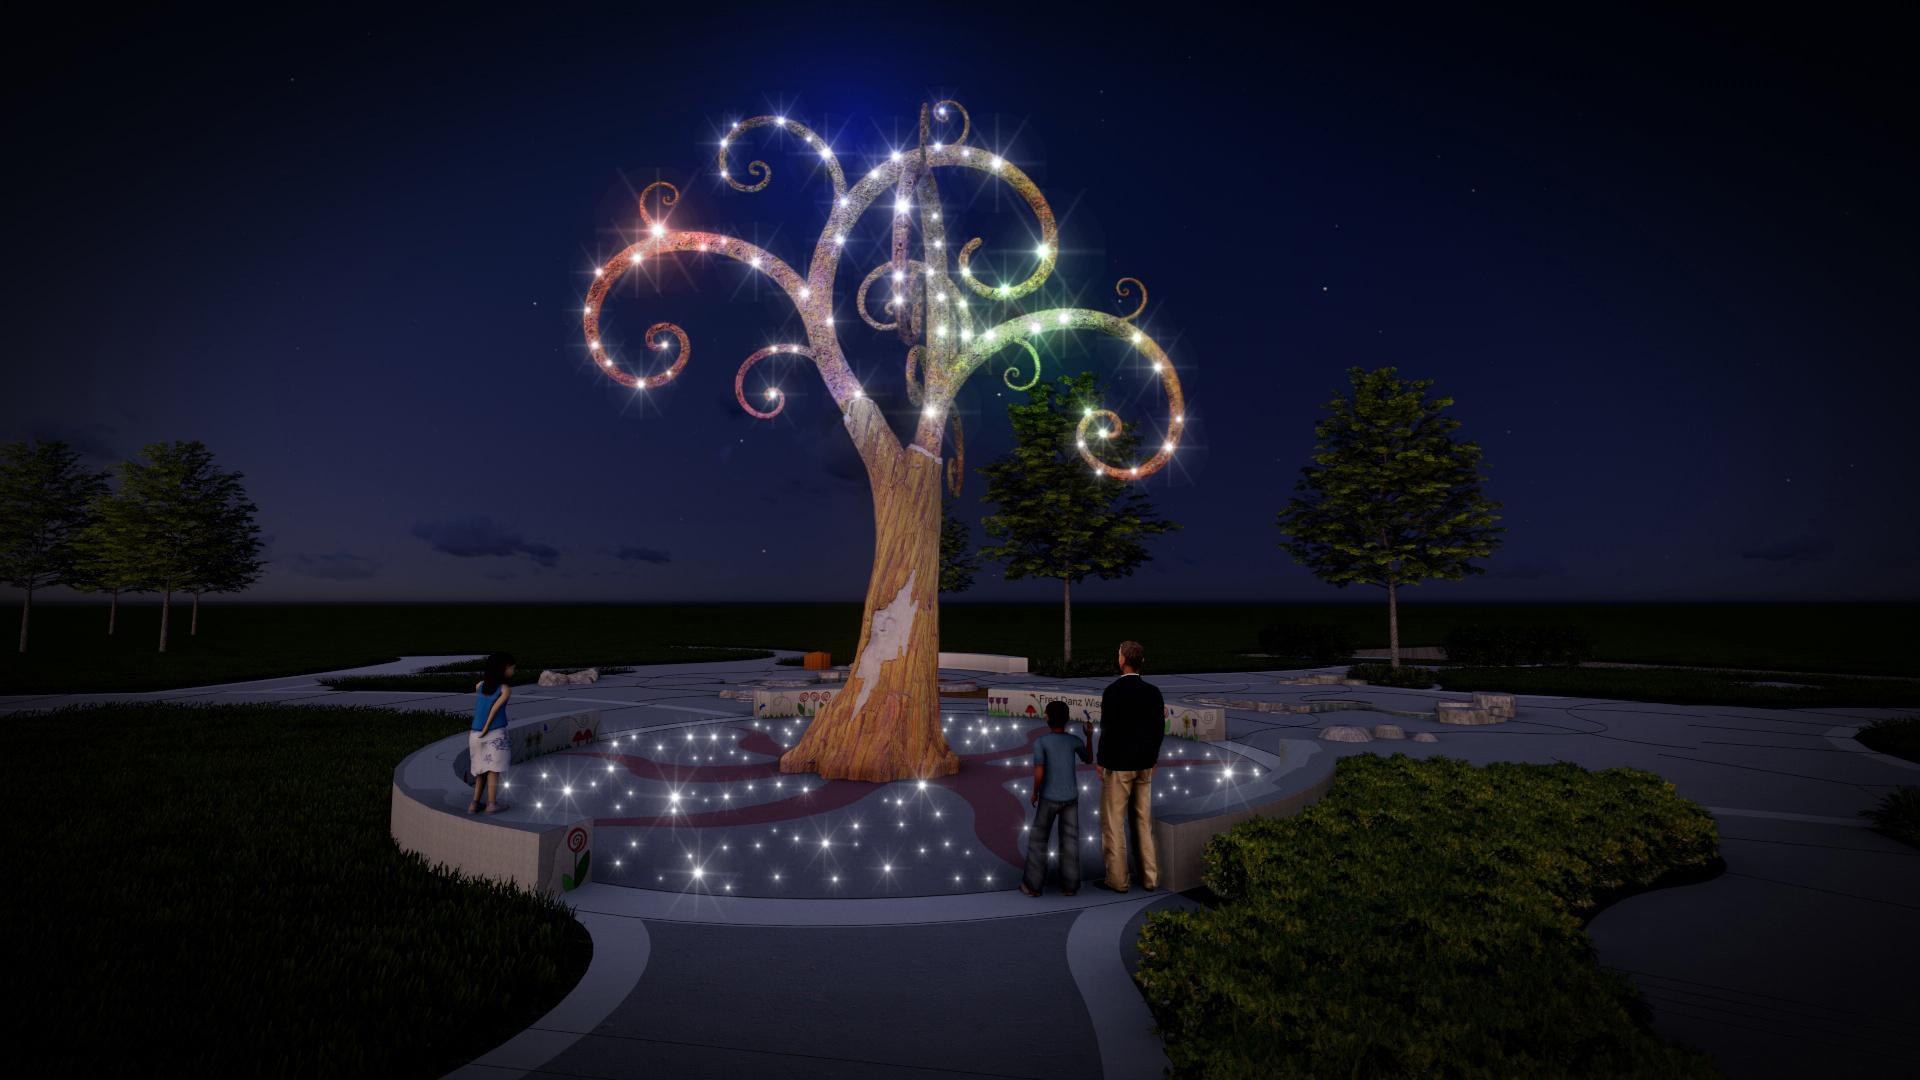 Inspiration Playground Wisdom Tree Bellevue Washington inclusive play playground custom art sculpture